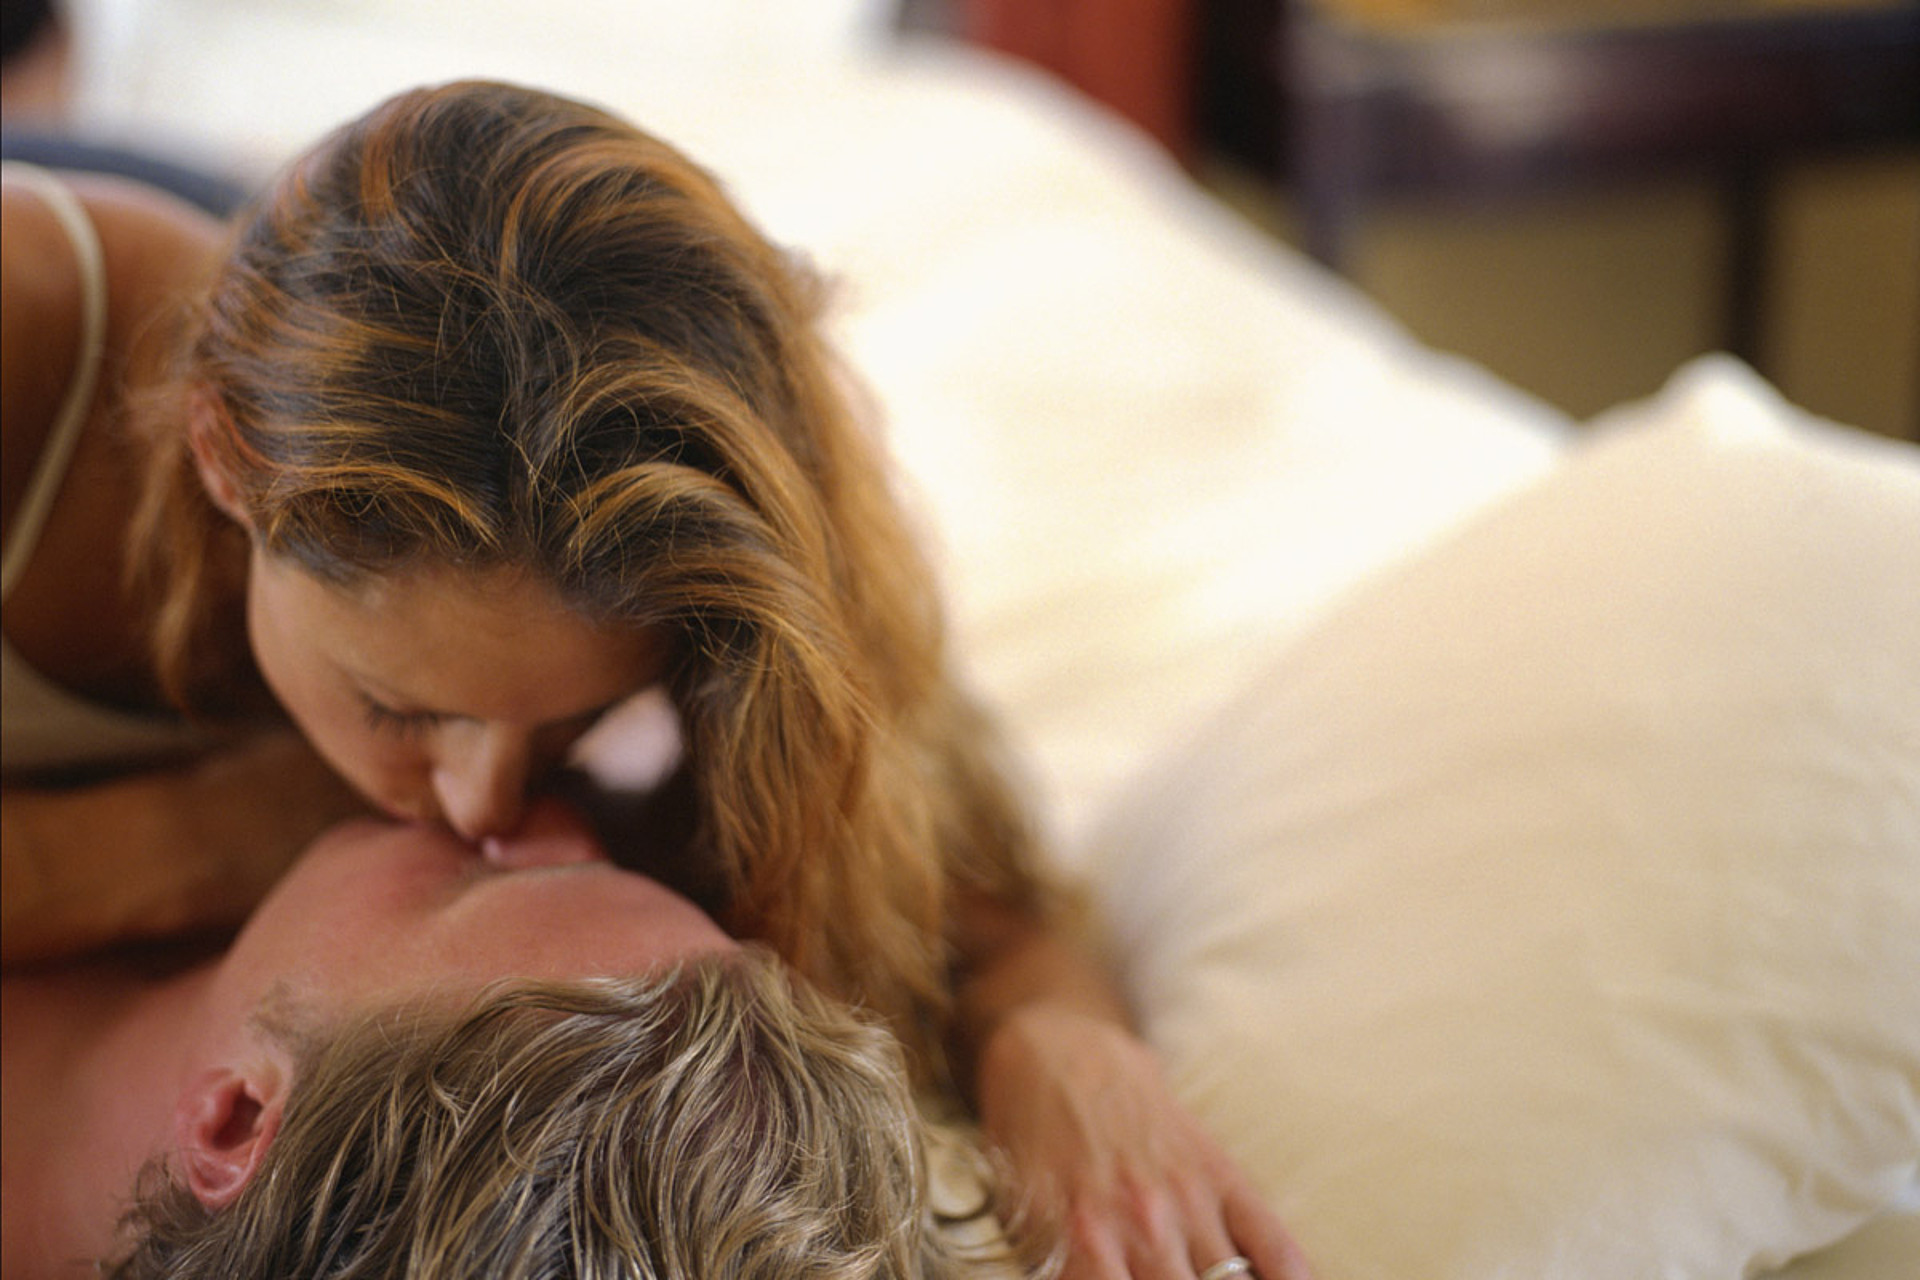 kostenlos sex com erotischer kuss